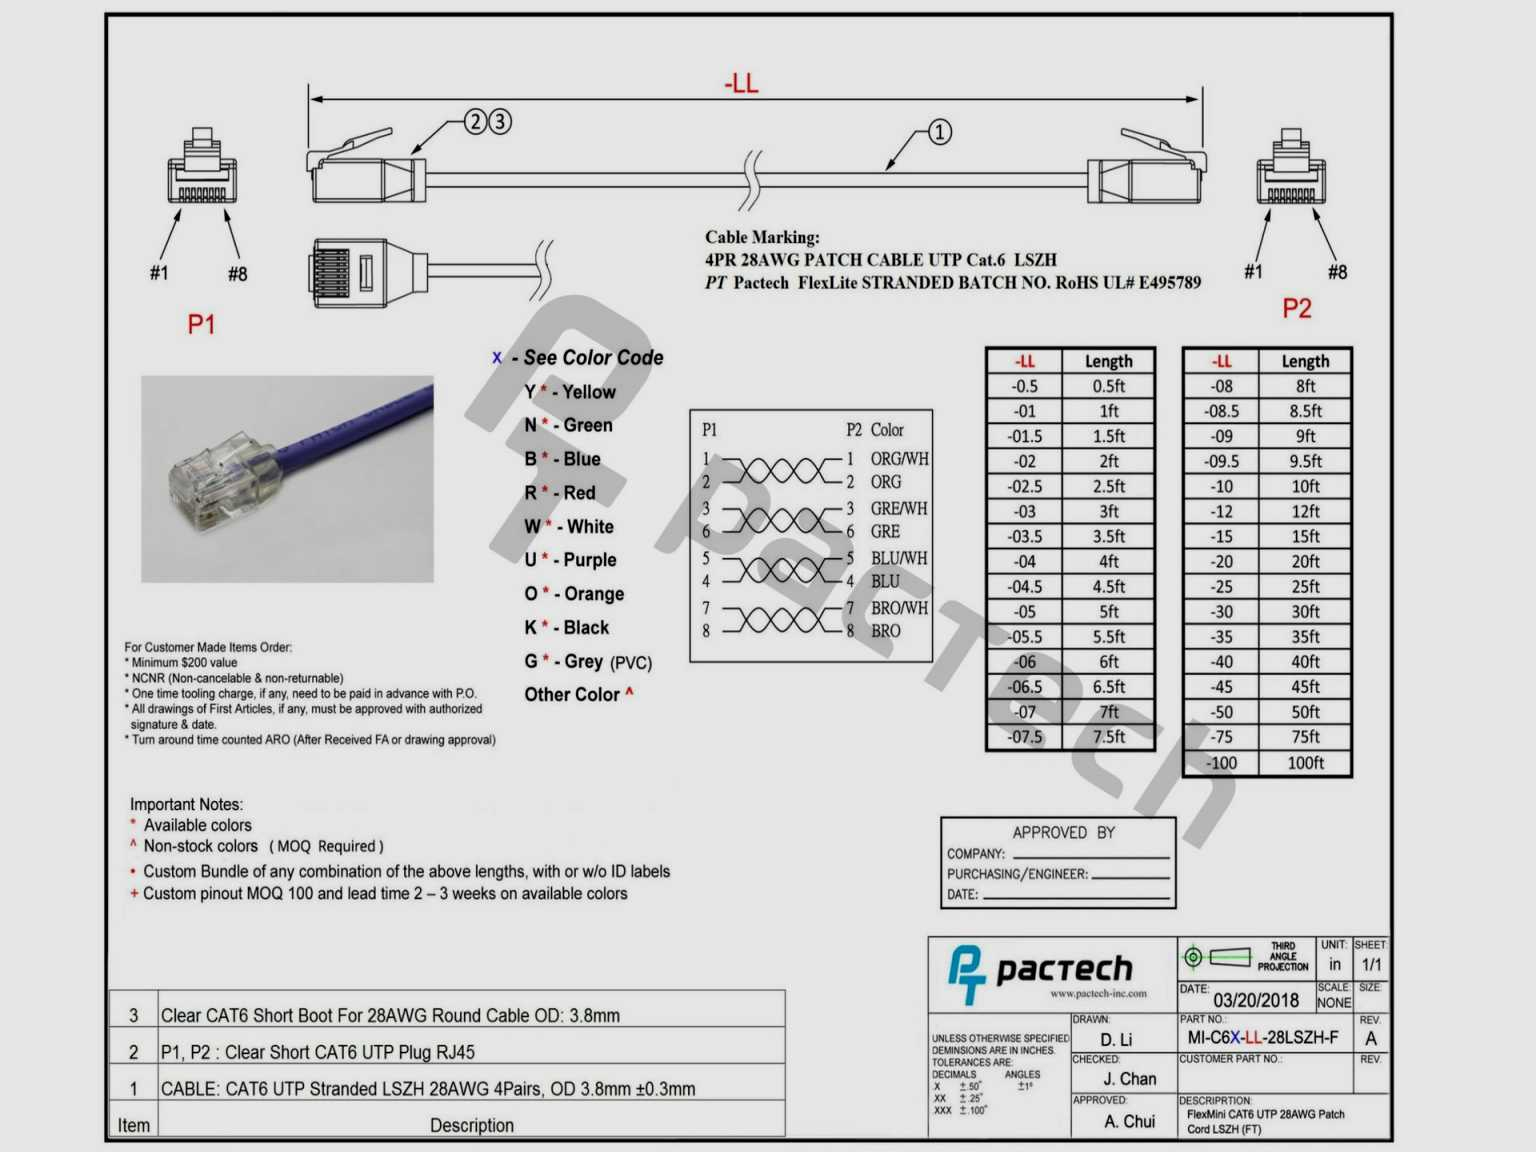 Tremendous Cat6 Utp Diagram Wiring Diagram Wiring Digital Resources Inamasemecshebarightsorg